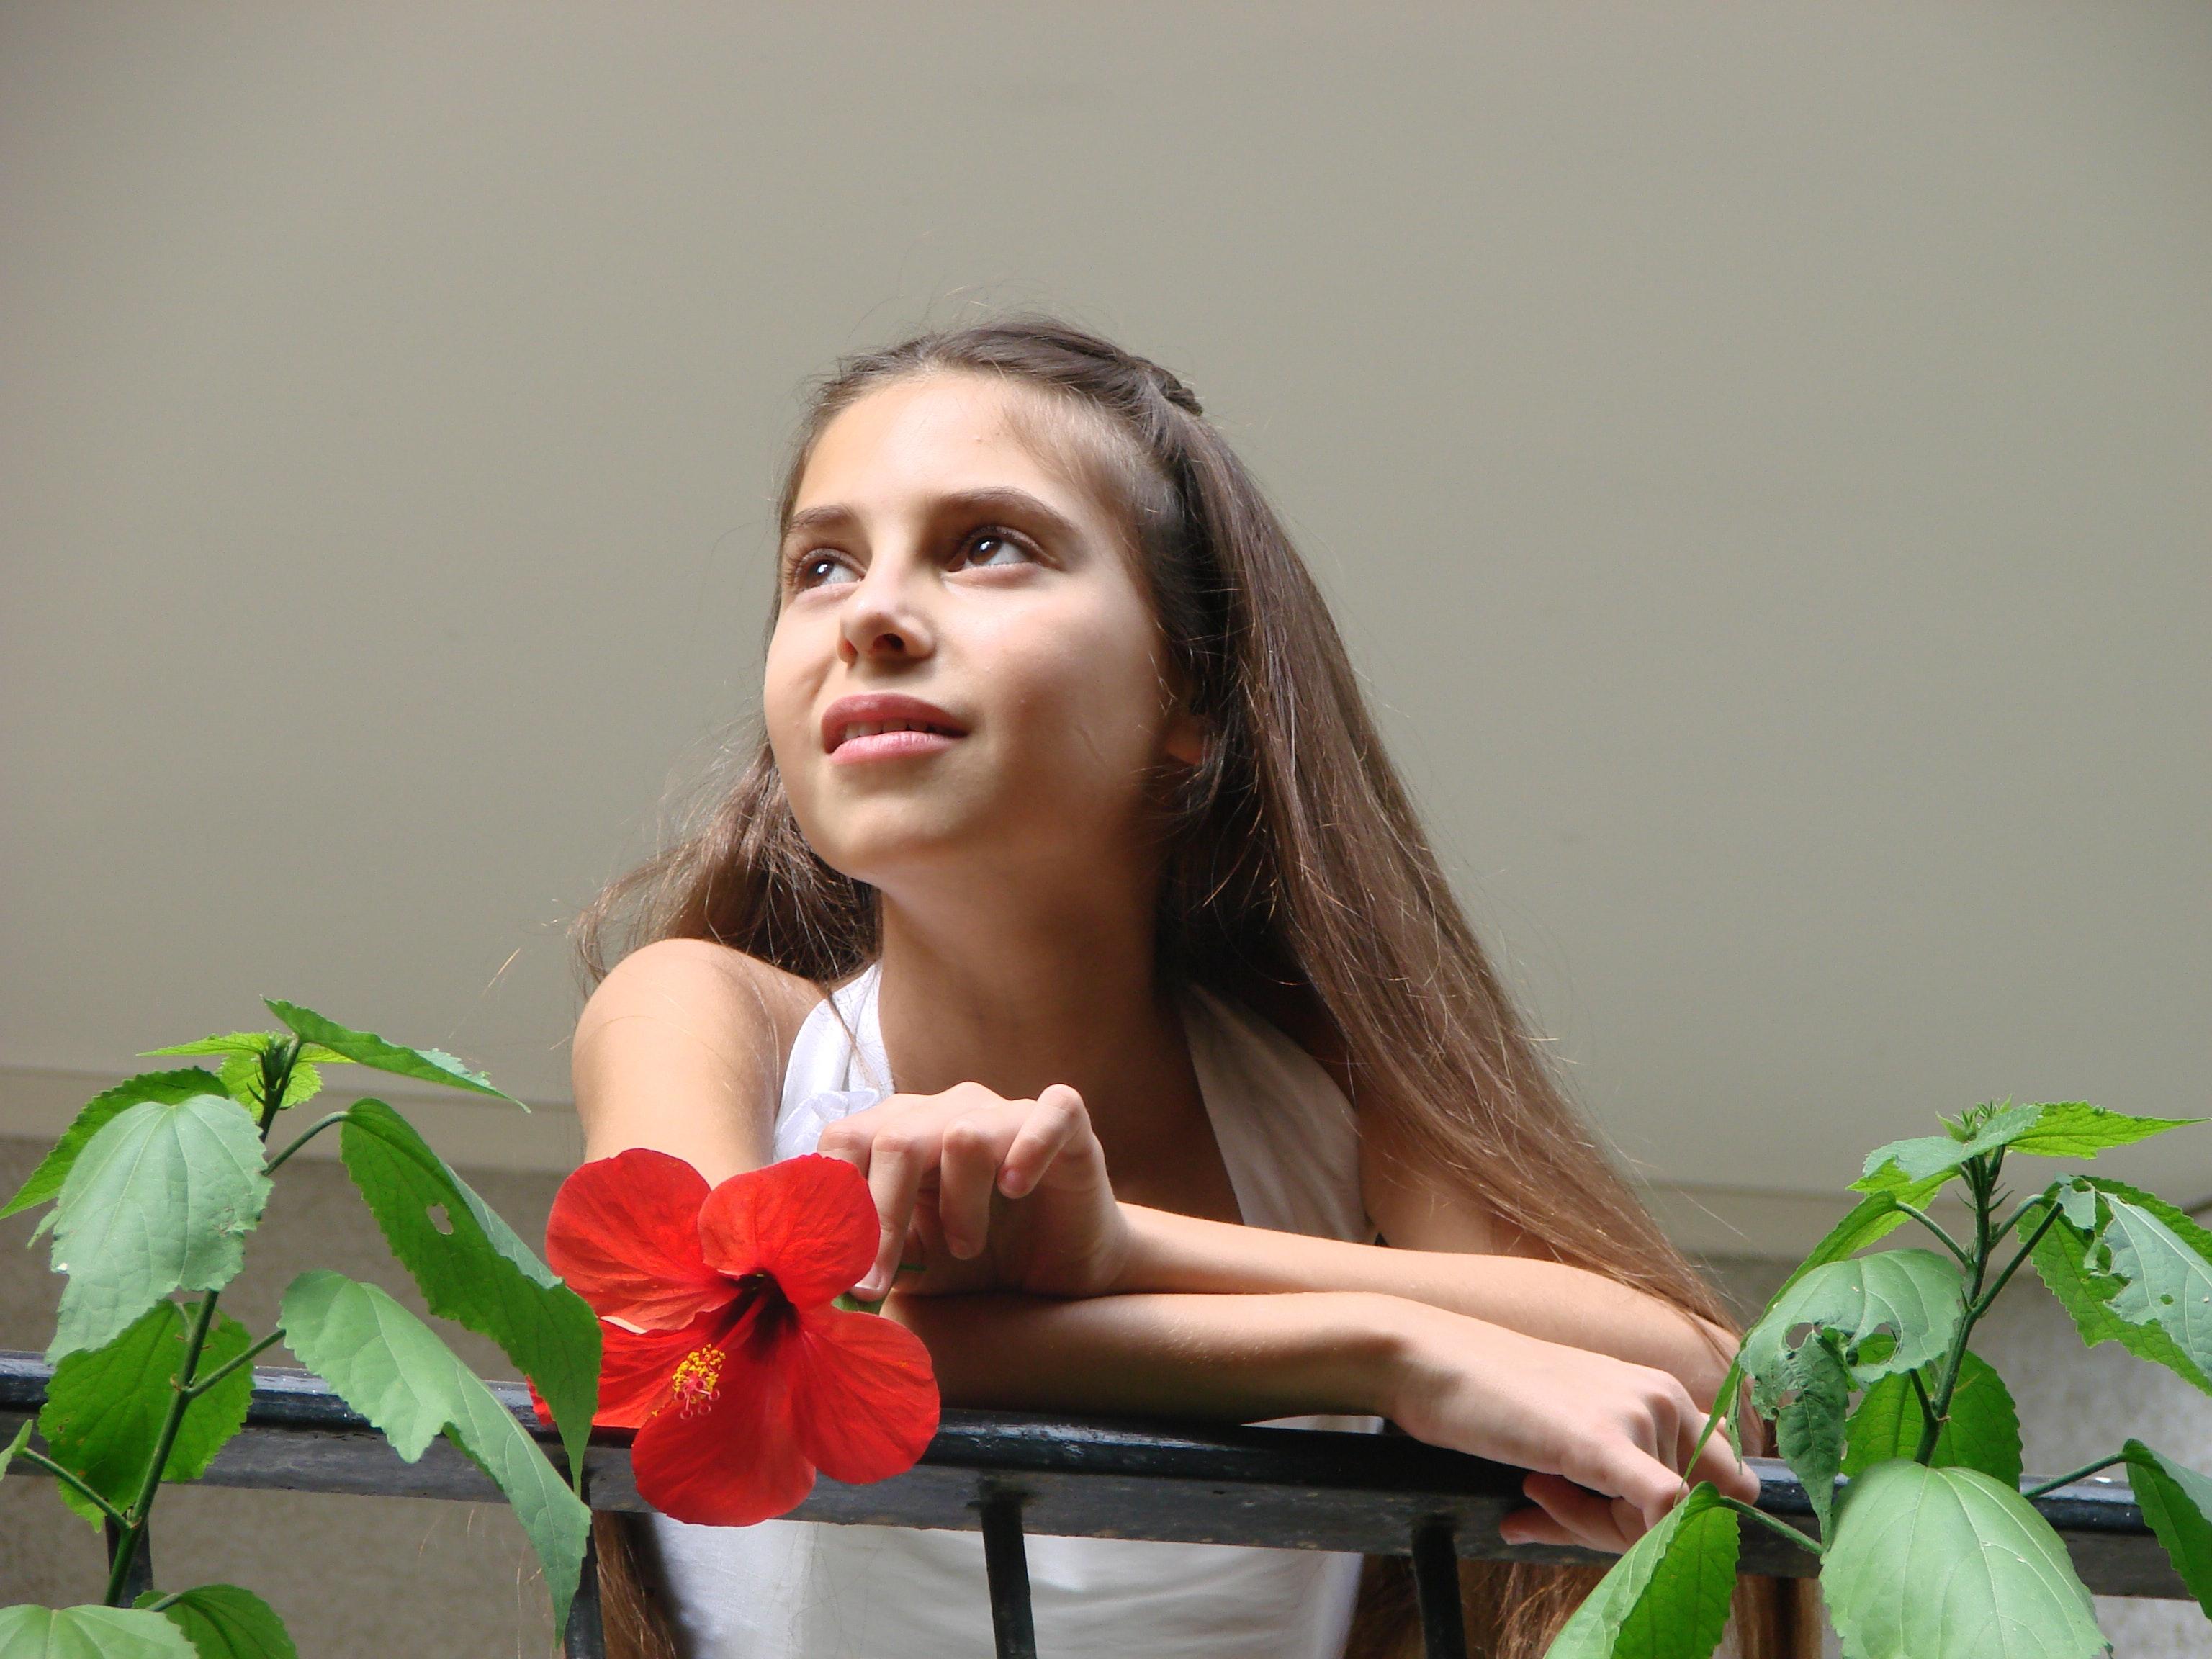 ba3b58f03cbca7 Free stock photo of jong meisje met rode bloem op balkon